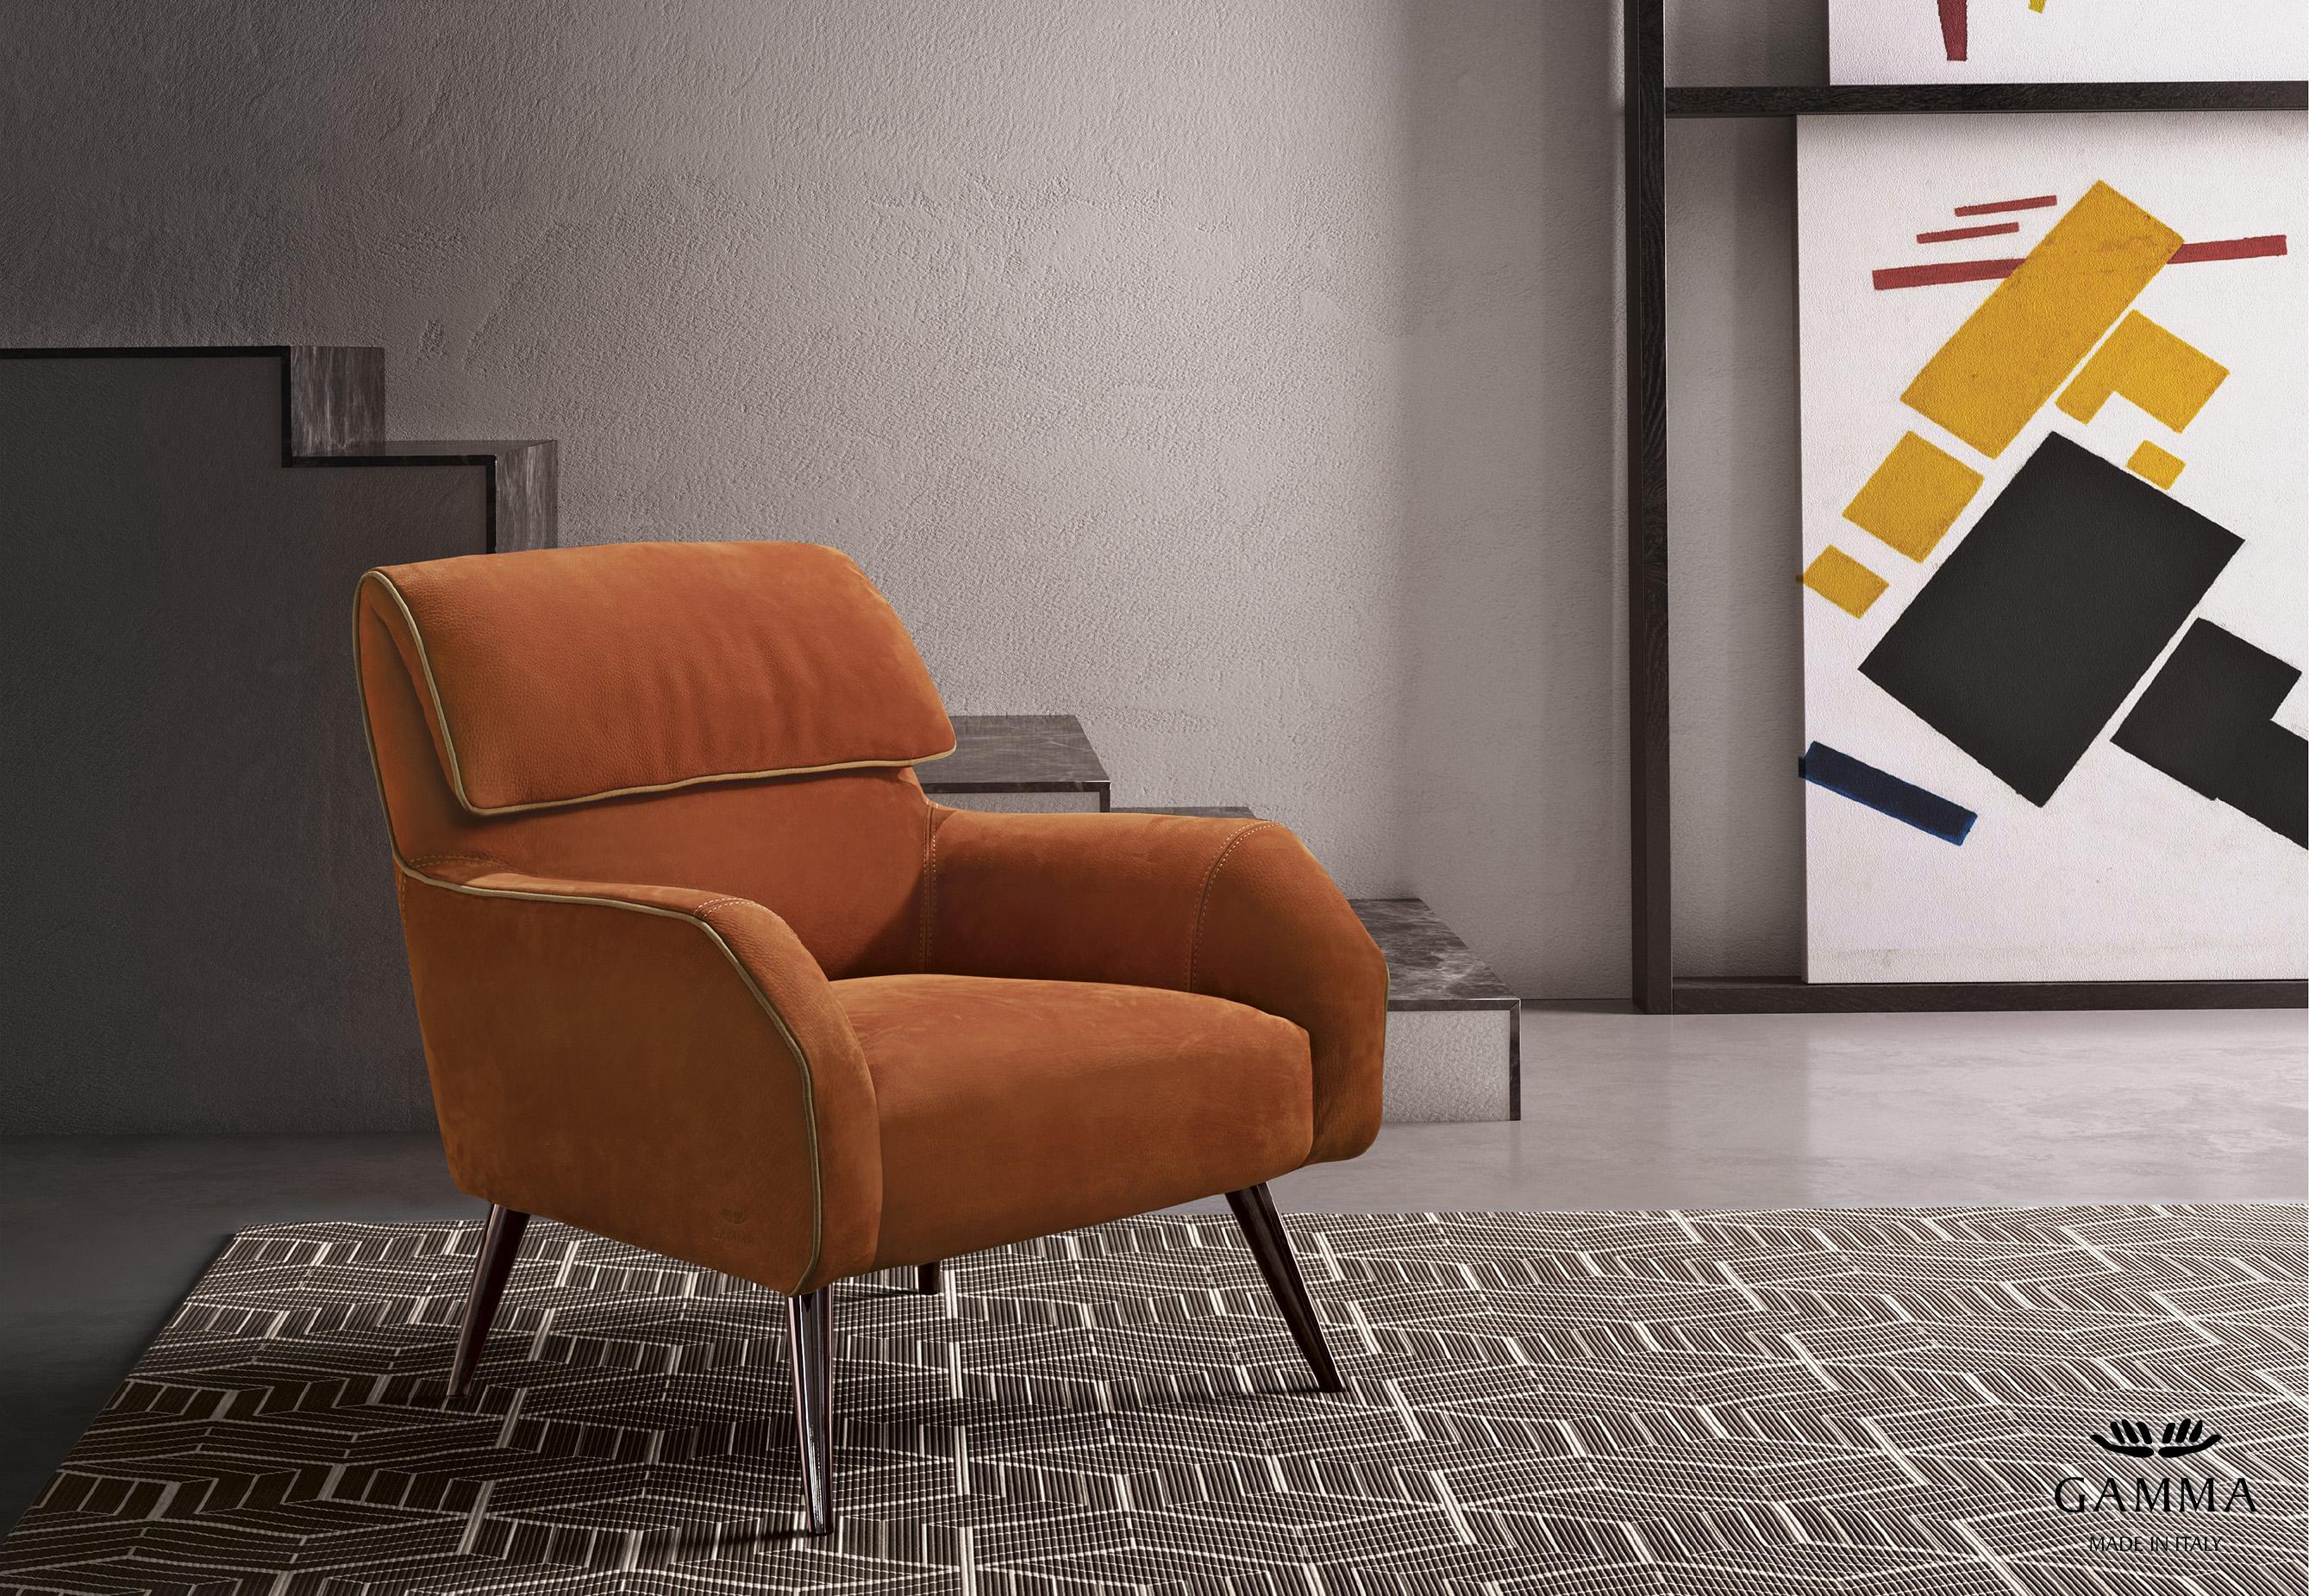 Gamma Gisele chair